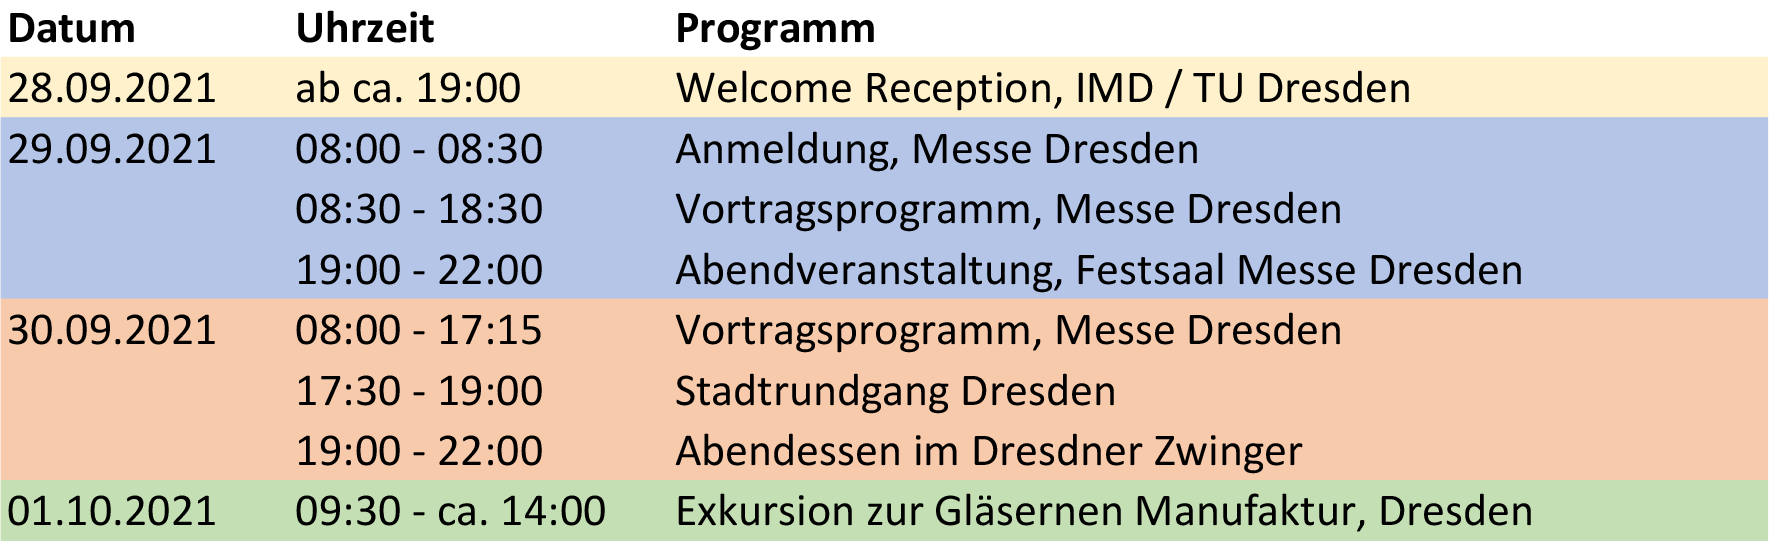 WGP-Agenda_2021-07-23